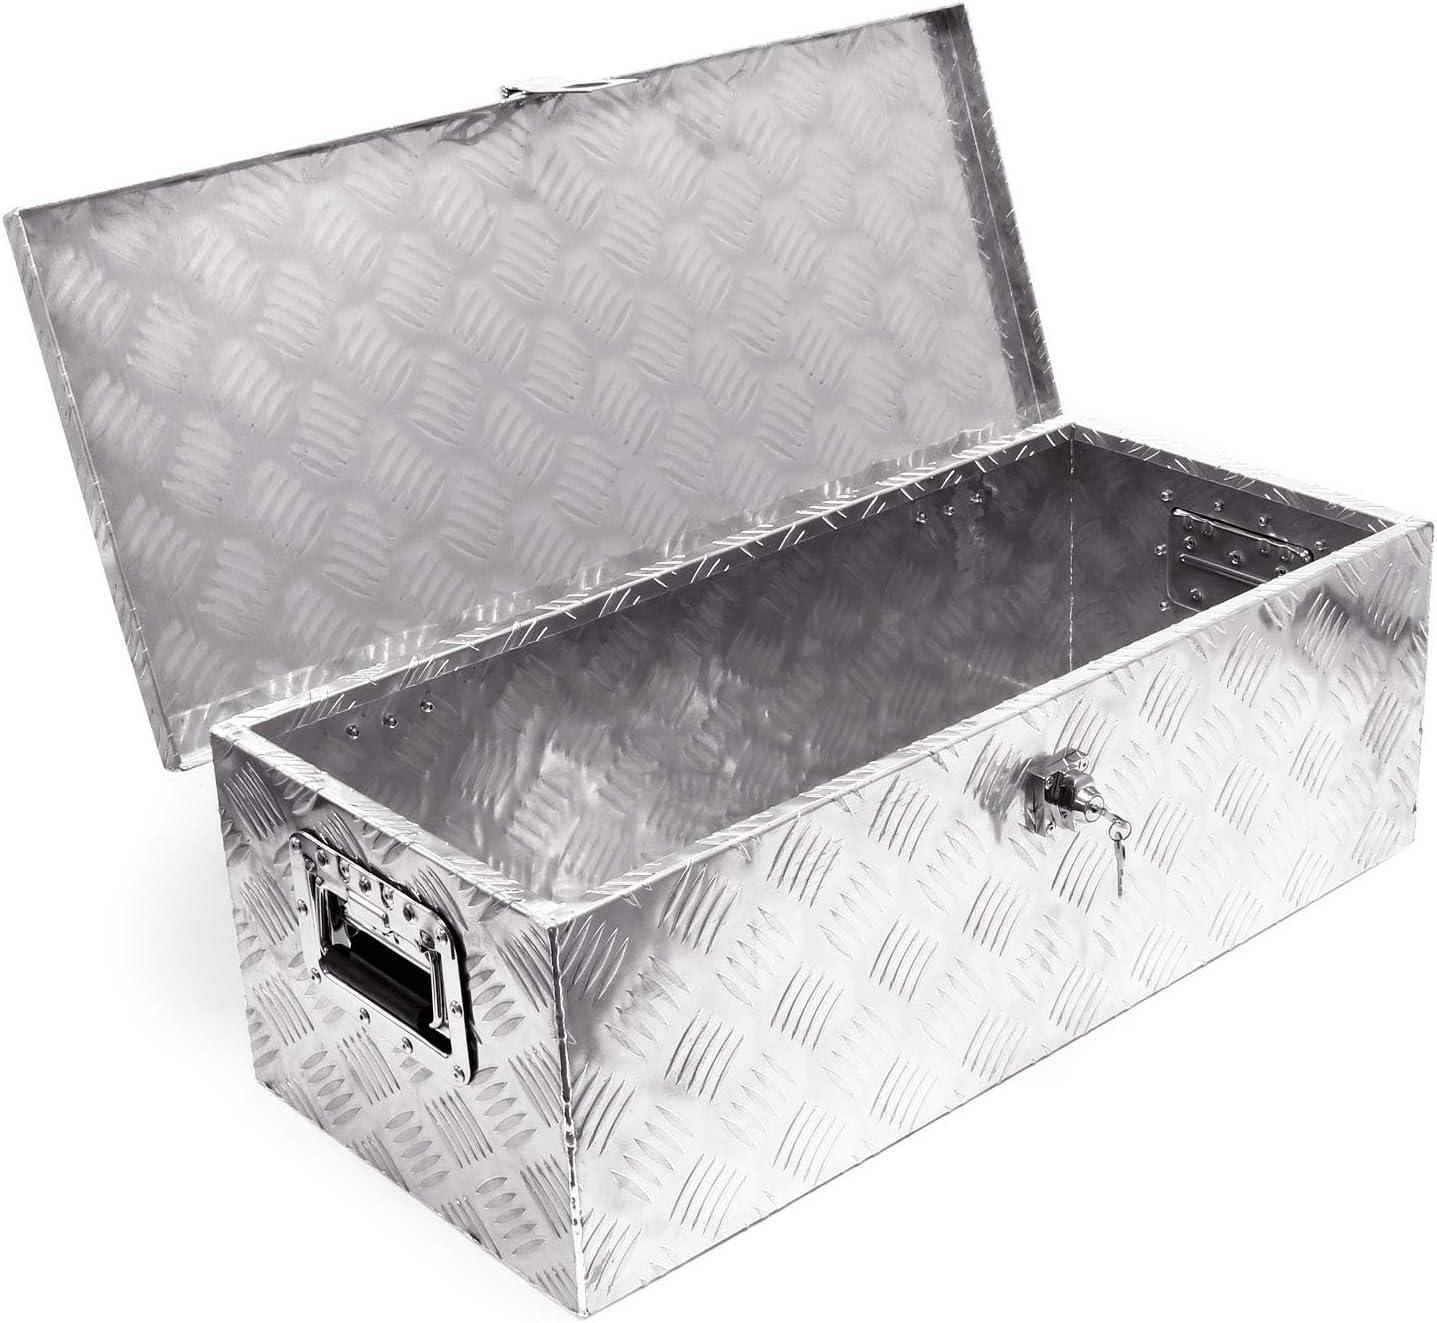 Grafner® Alu Transportbox Transportkiste 145x52x46 cm Werkzeugkasten Box Kiste